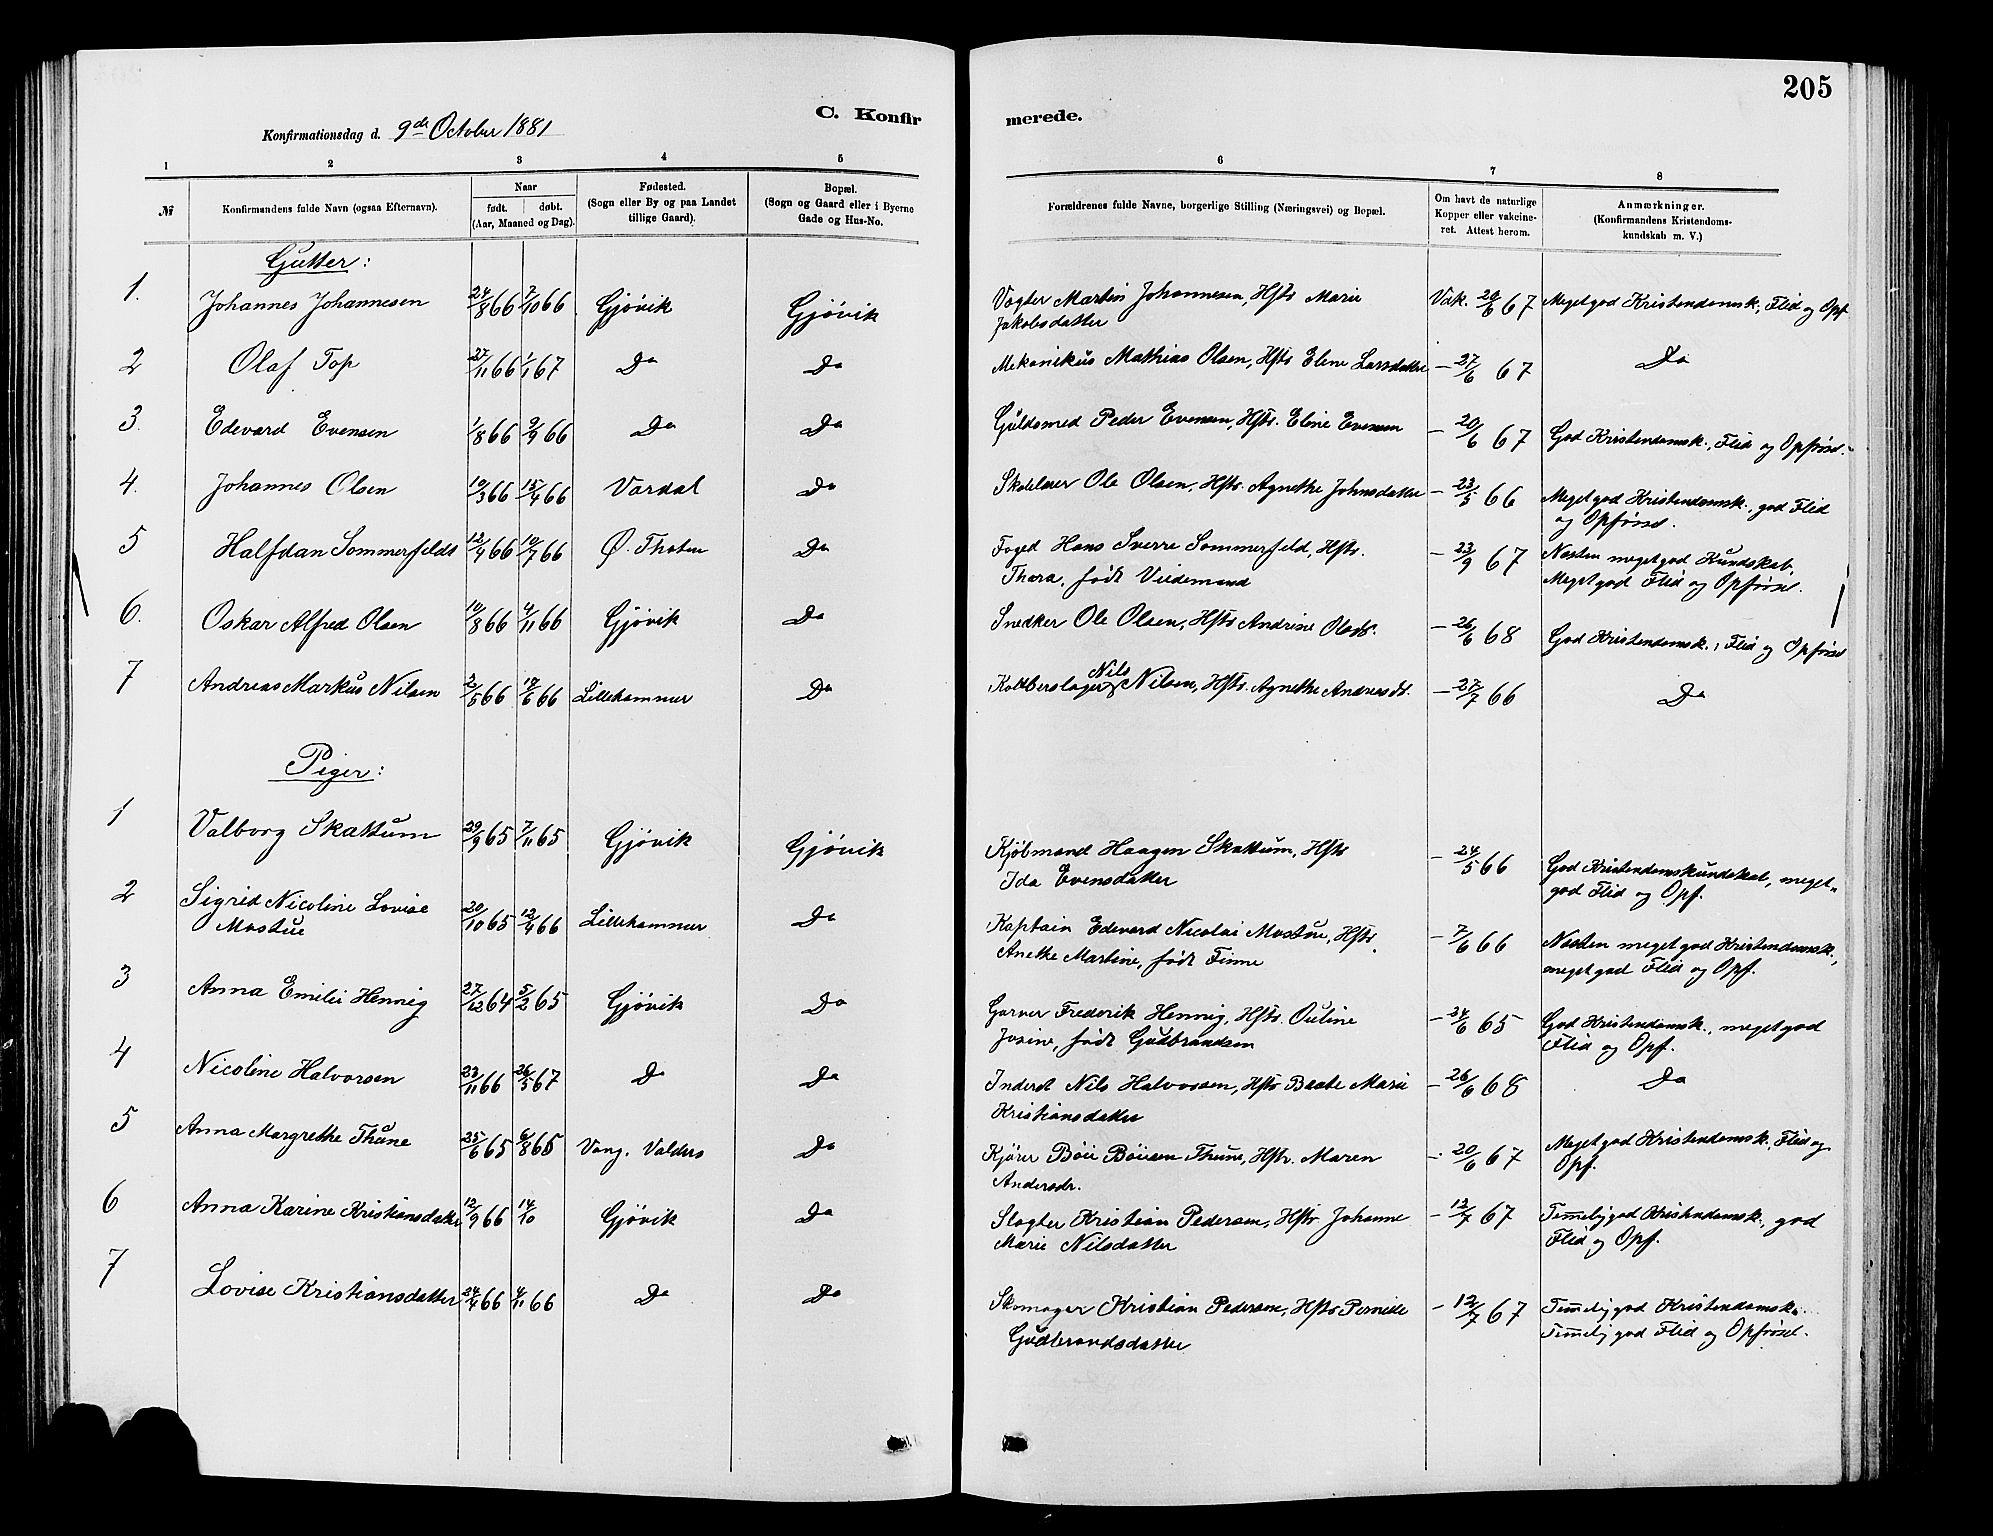 SAH, Vardal prestekontor, H/Ha/Hab/L0007: Klokkerbok nr. 7 /2, 1881-1895, s. 205